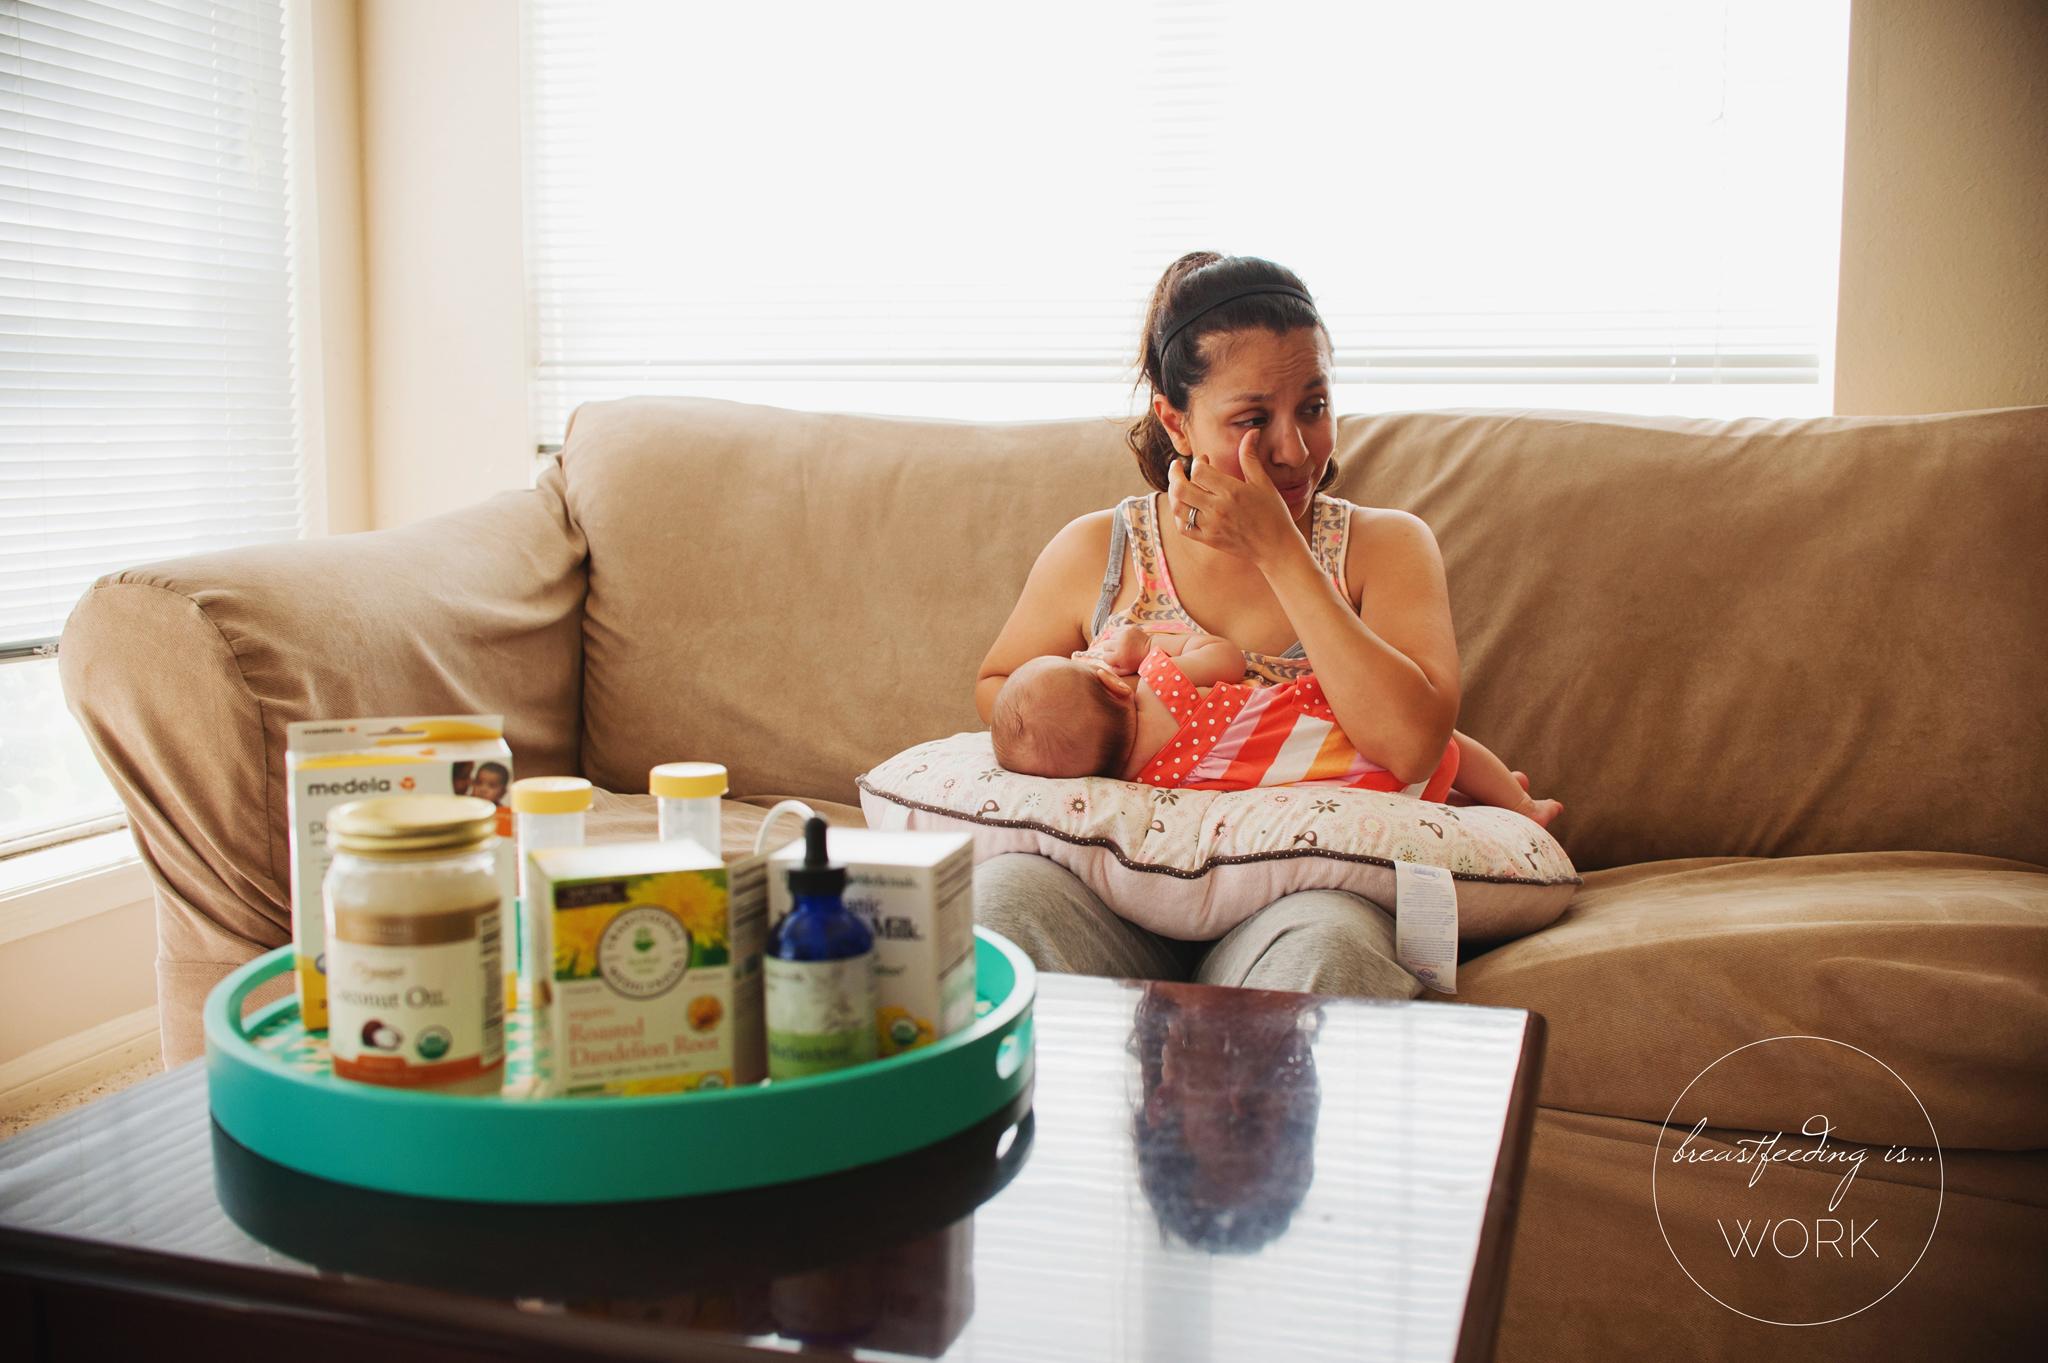 Breastfeeding-Is-Work